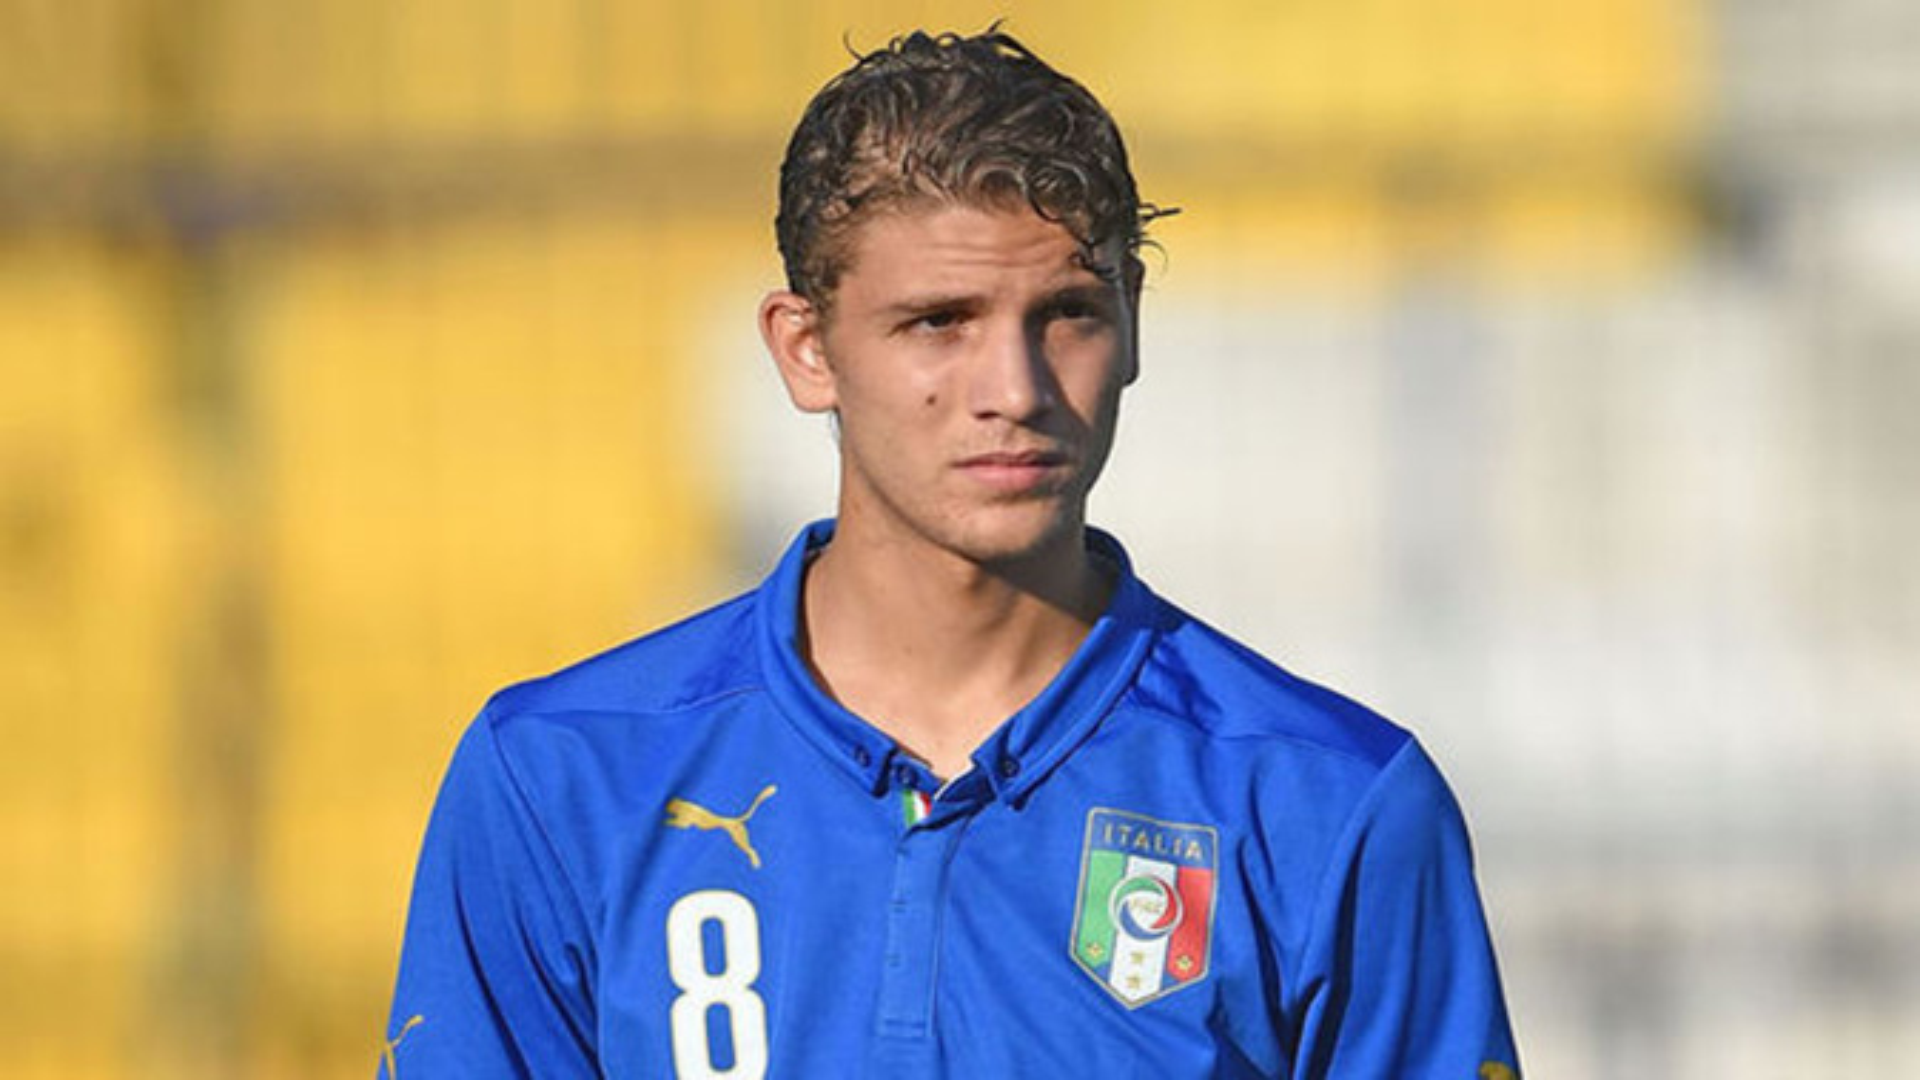 مانوئل لوکاتلی بهترین بازیکن هفته هفتم سری A ایتالیا 2016-2017